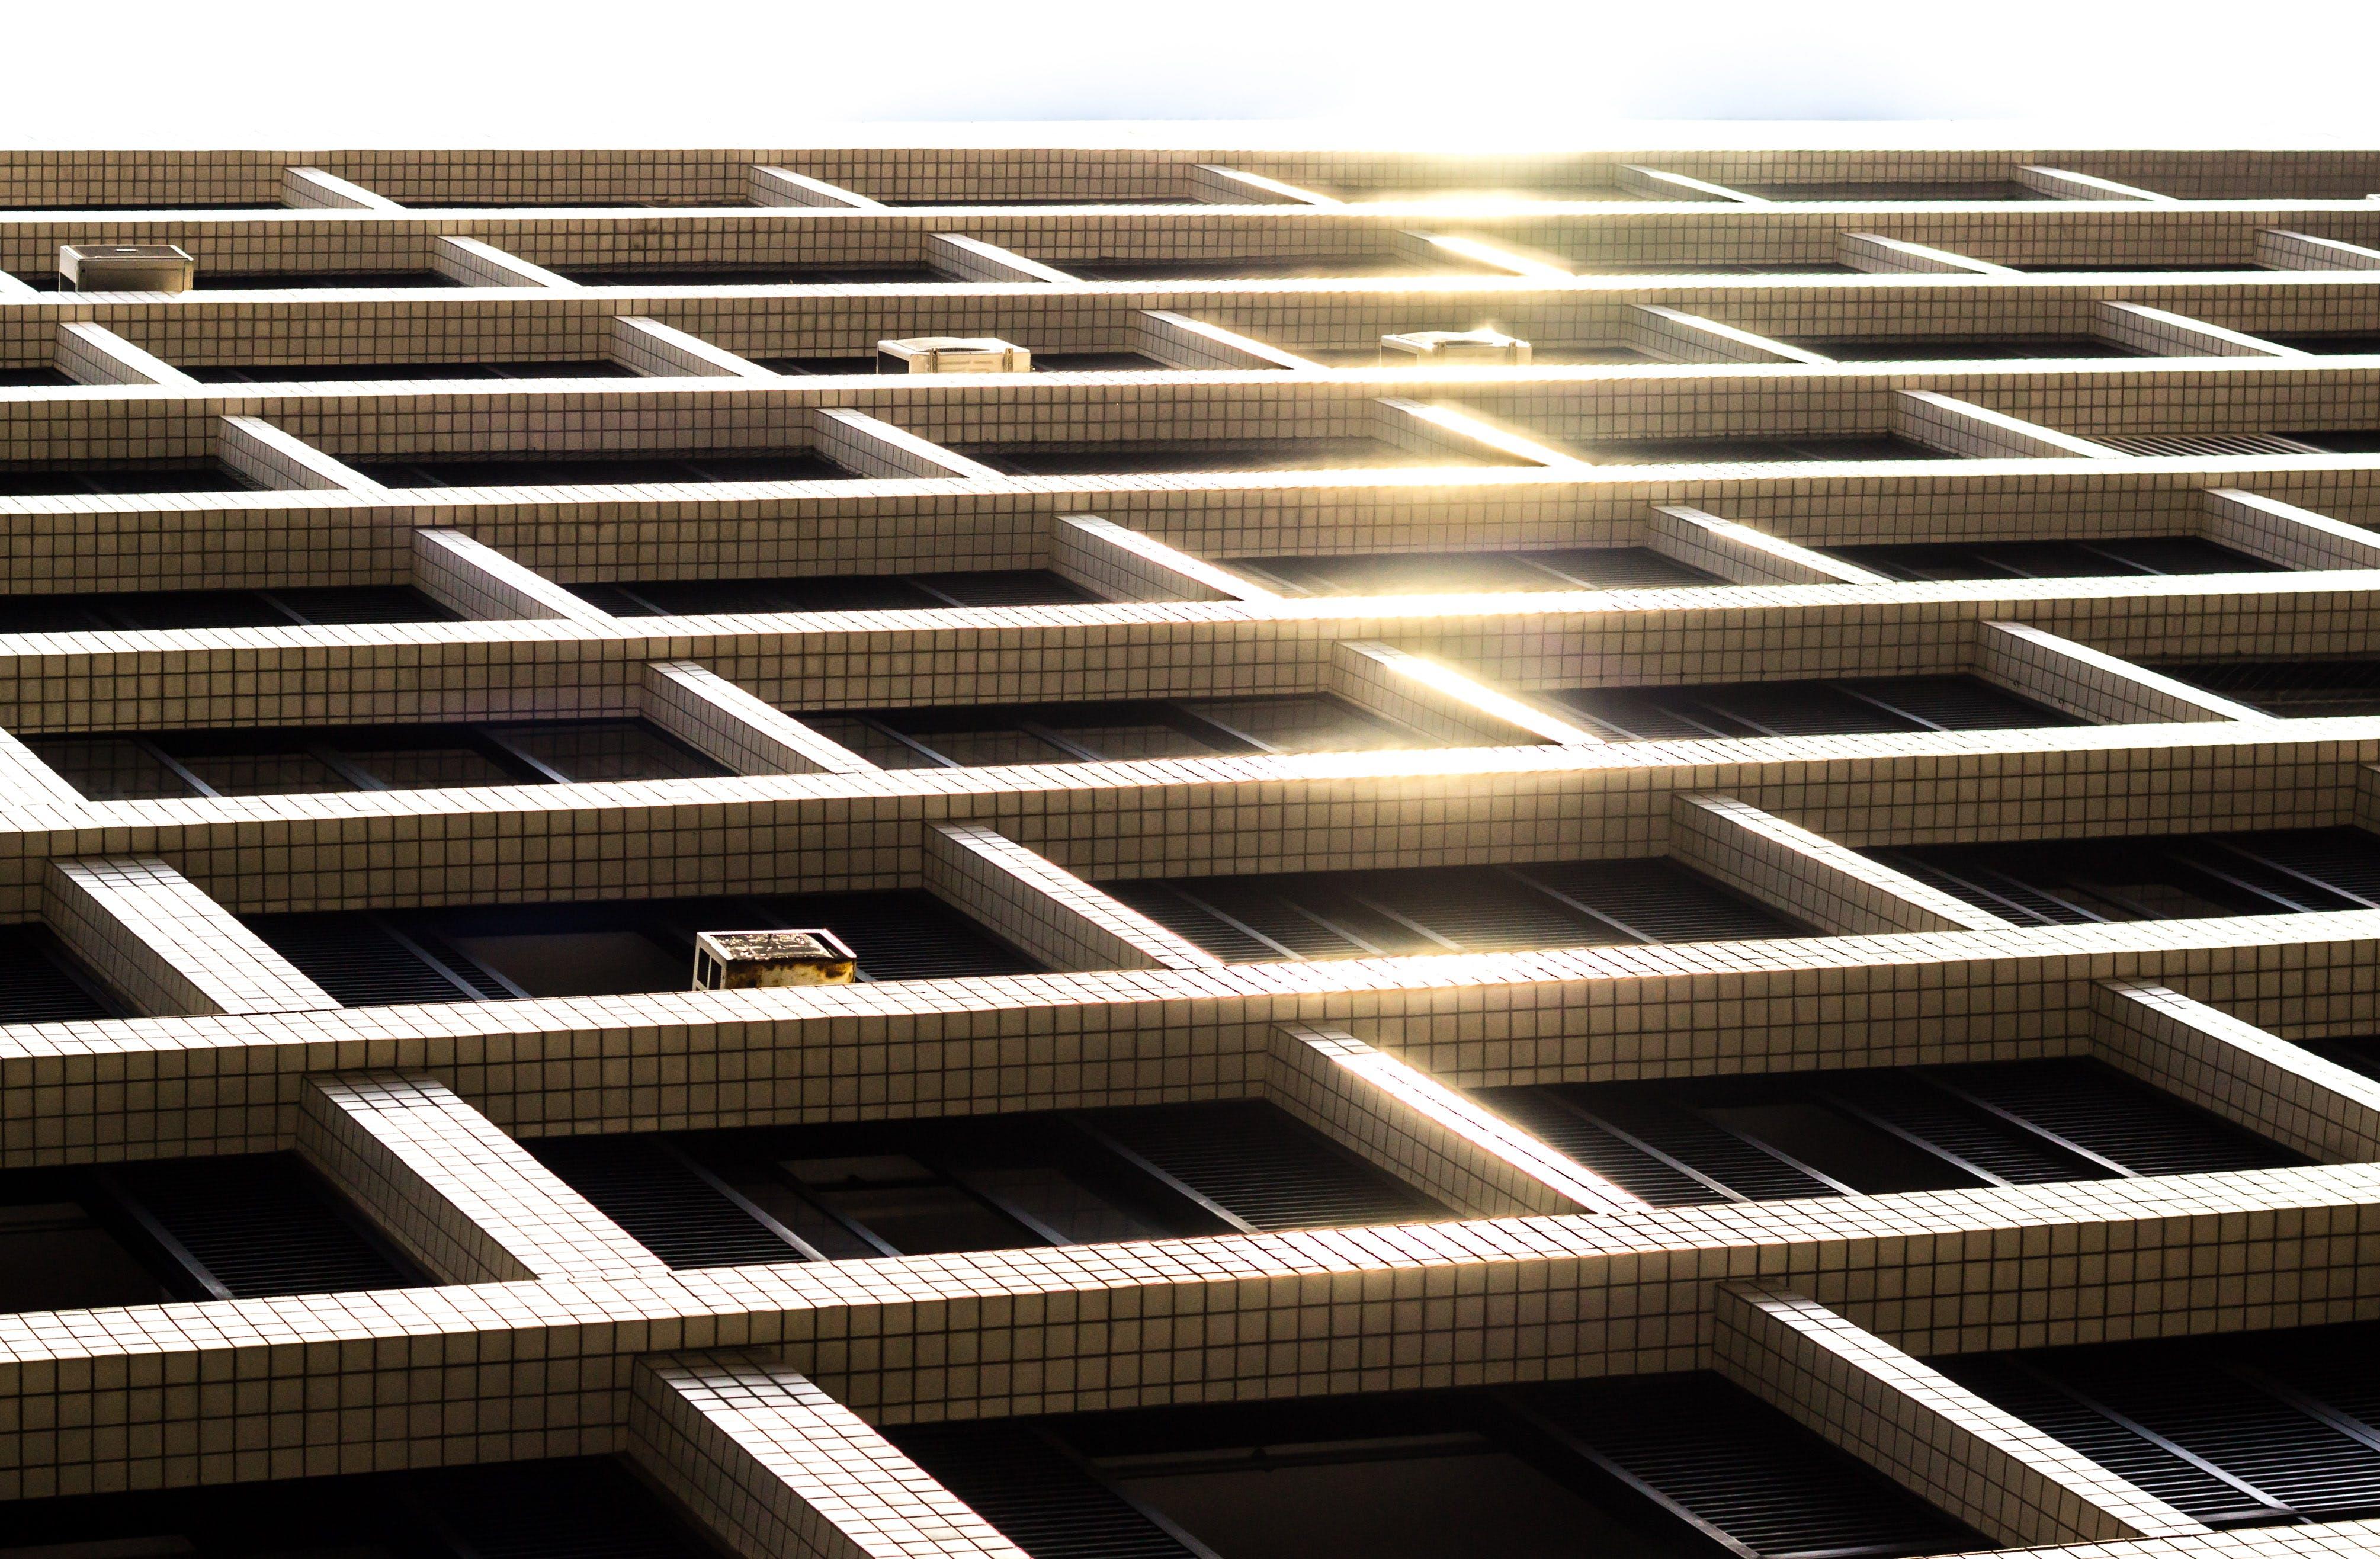 Free stock photo of city, street, urban, apartment buildings